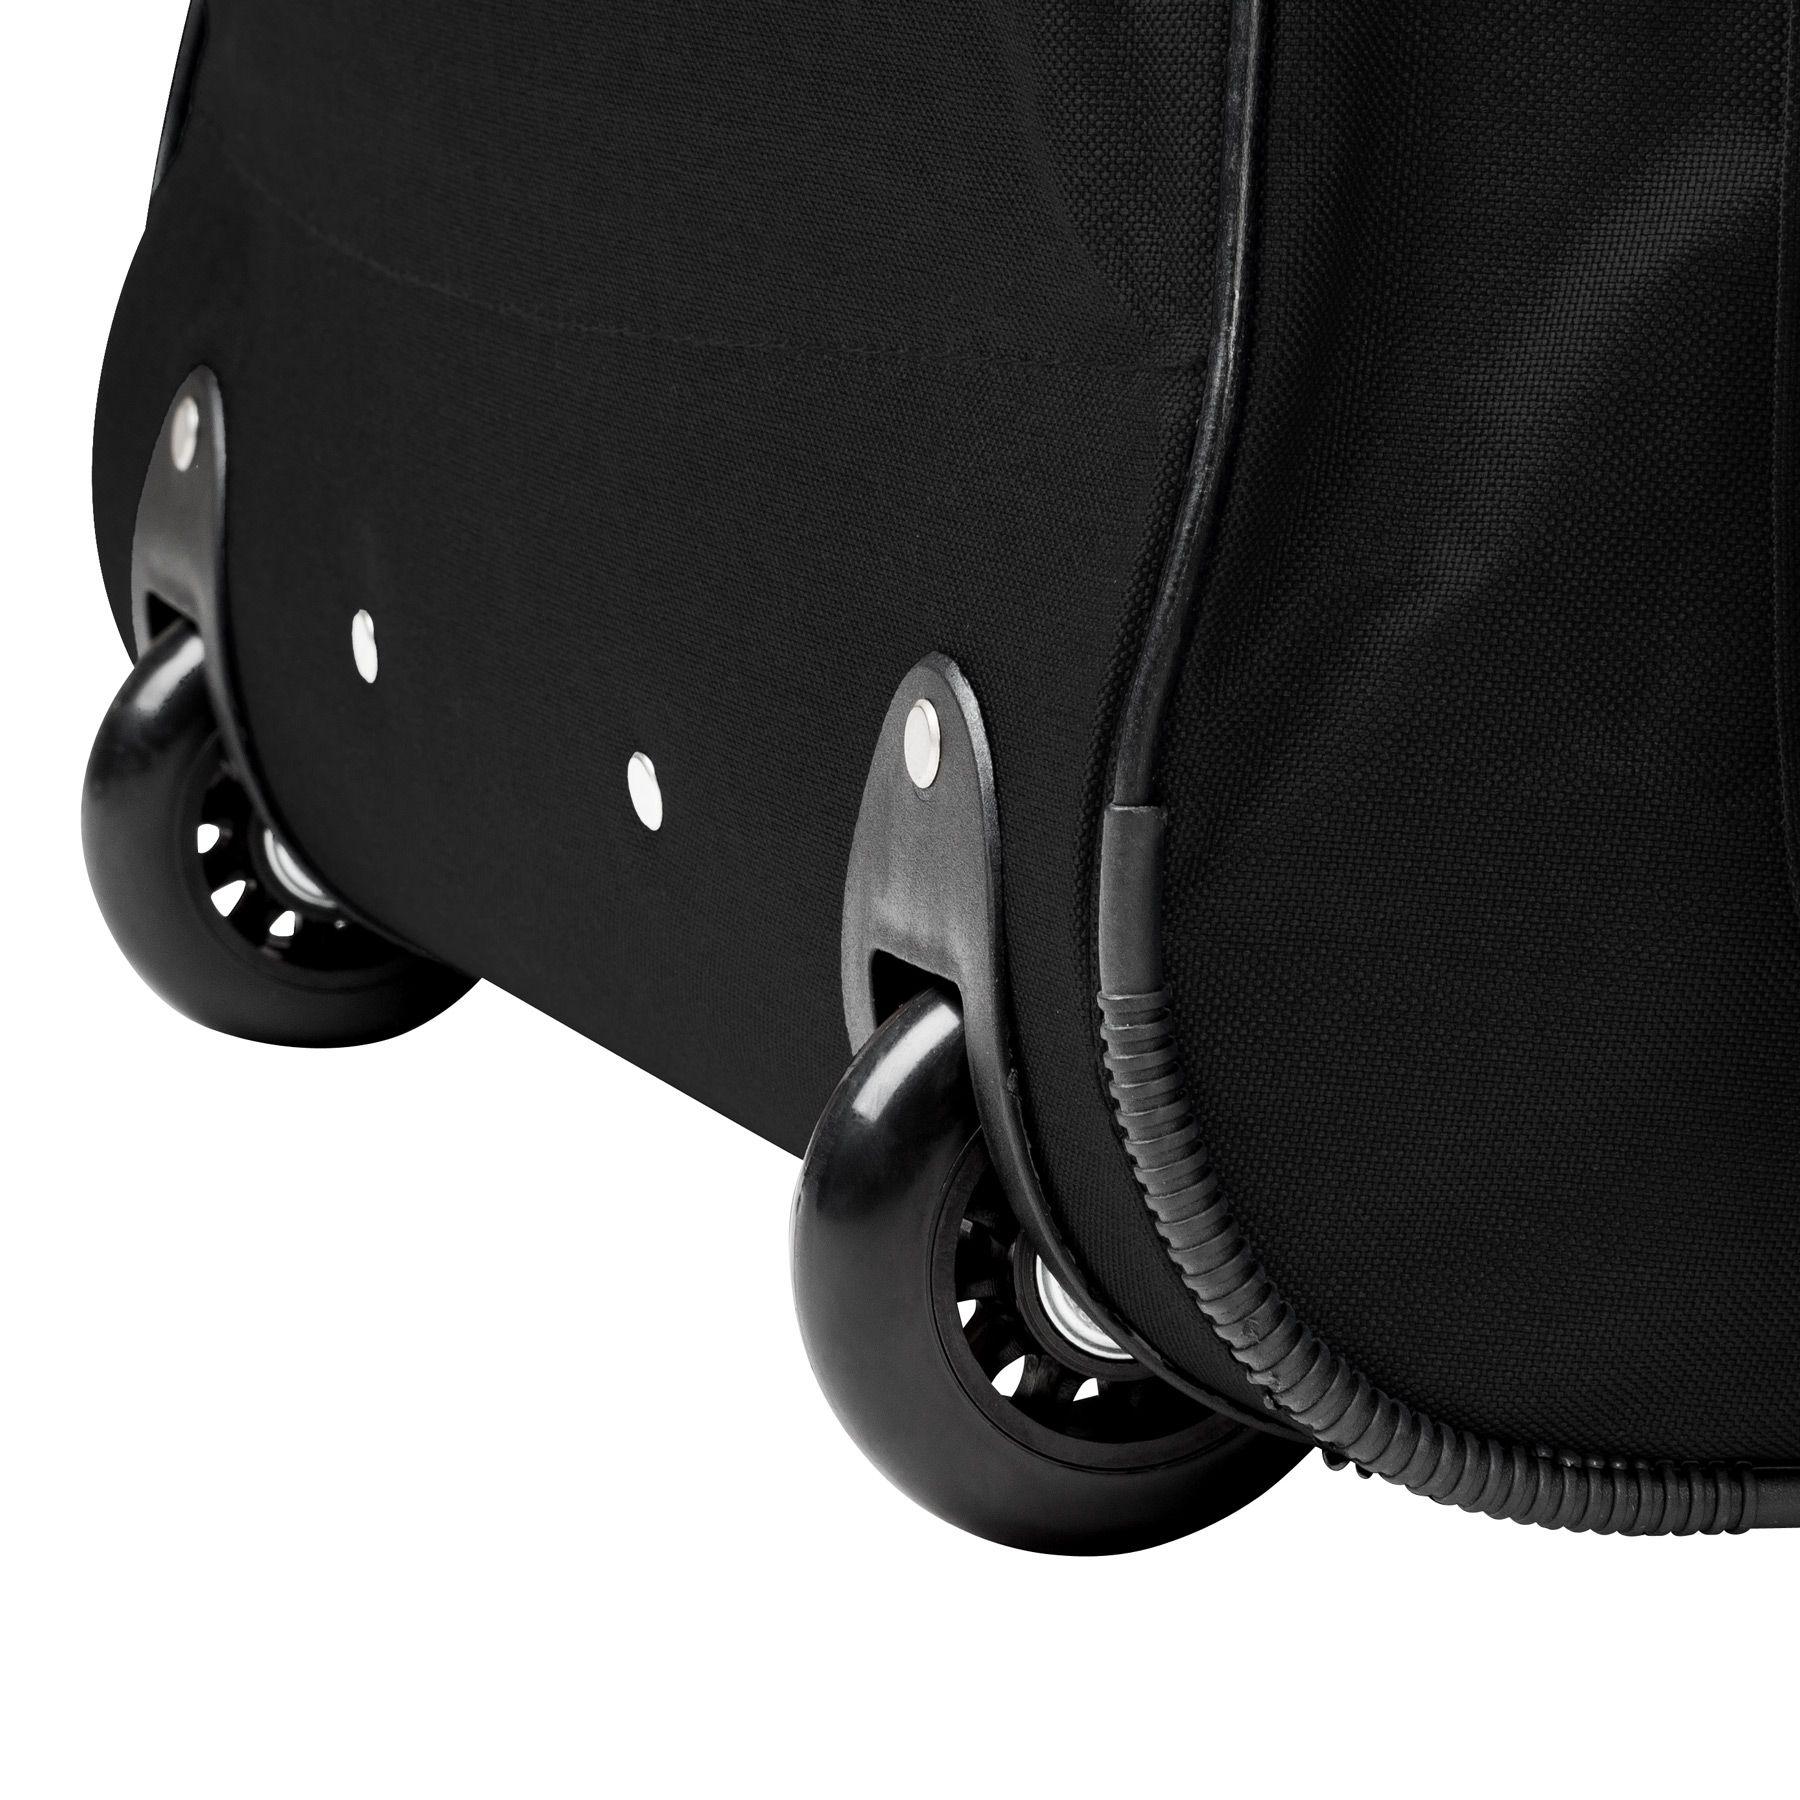 ab978f024 XXL Bolsa de viaje deportes maleta trolley grande caso de equipaje 160L |  eBay